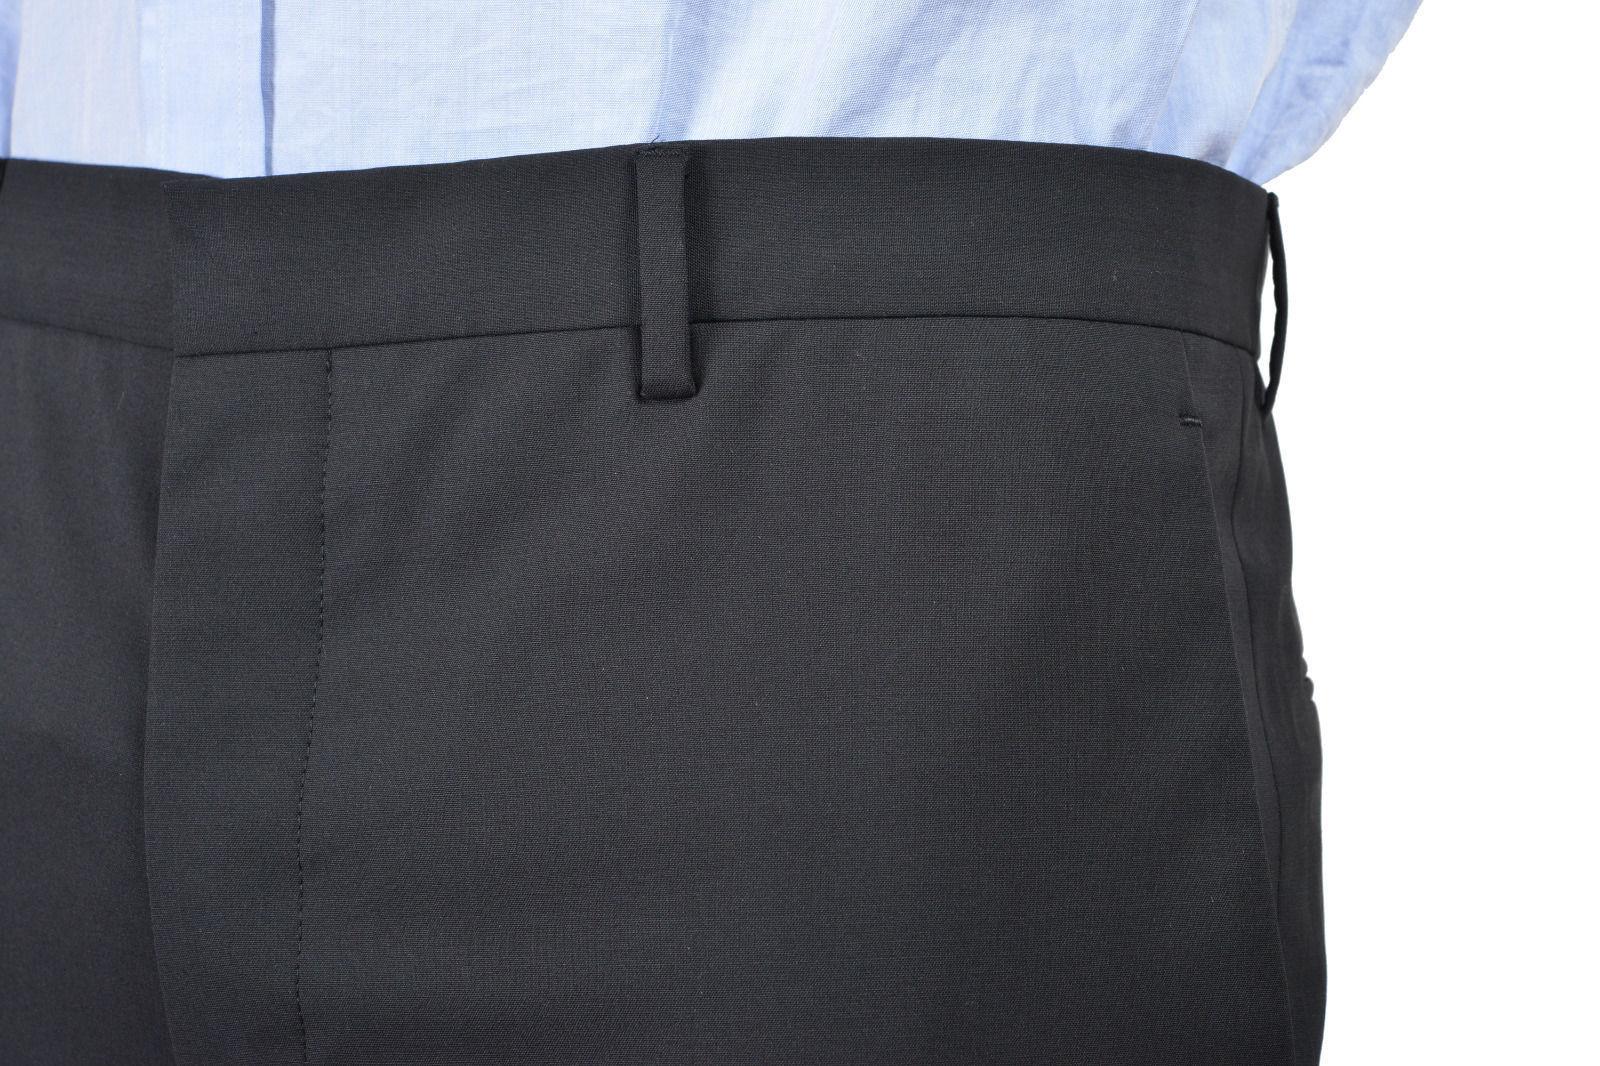 b41e0905 Prada Men's Black Flat Front Wool Pants Size US 30 IT 46